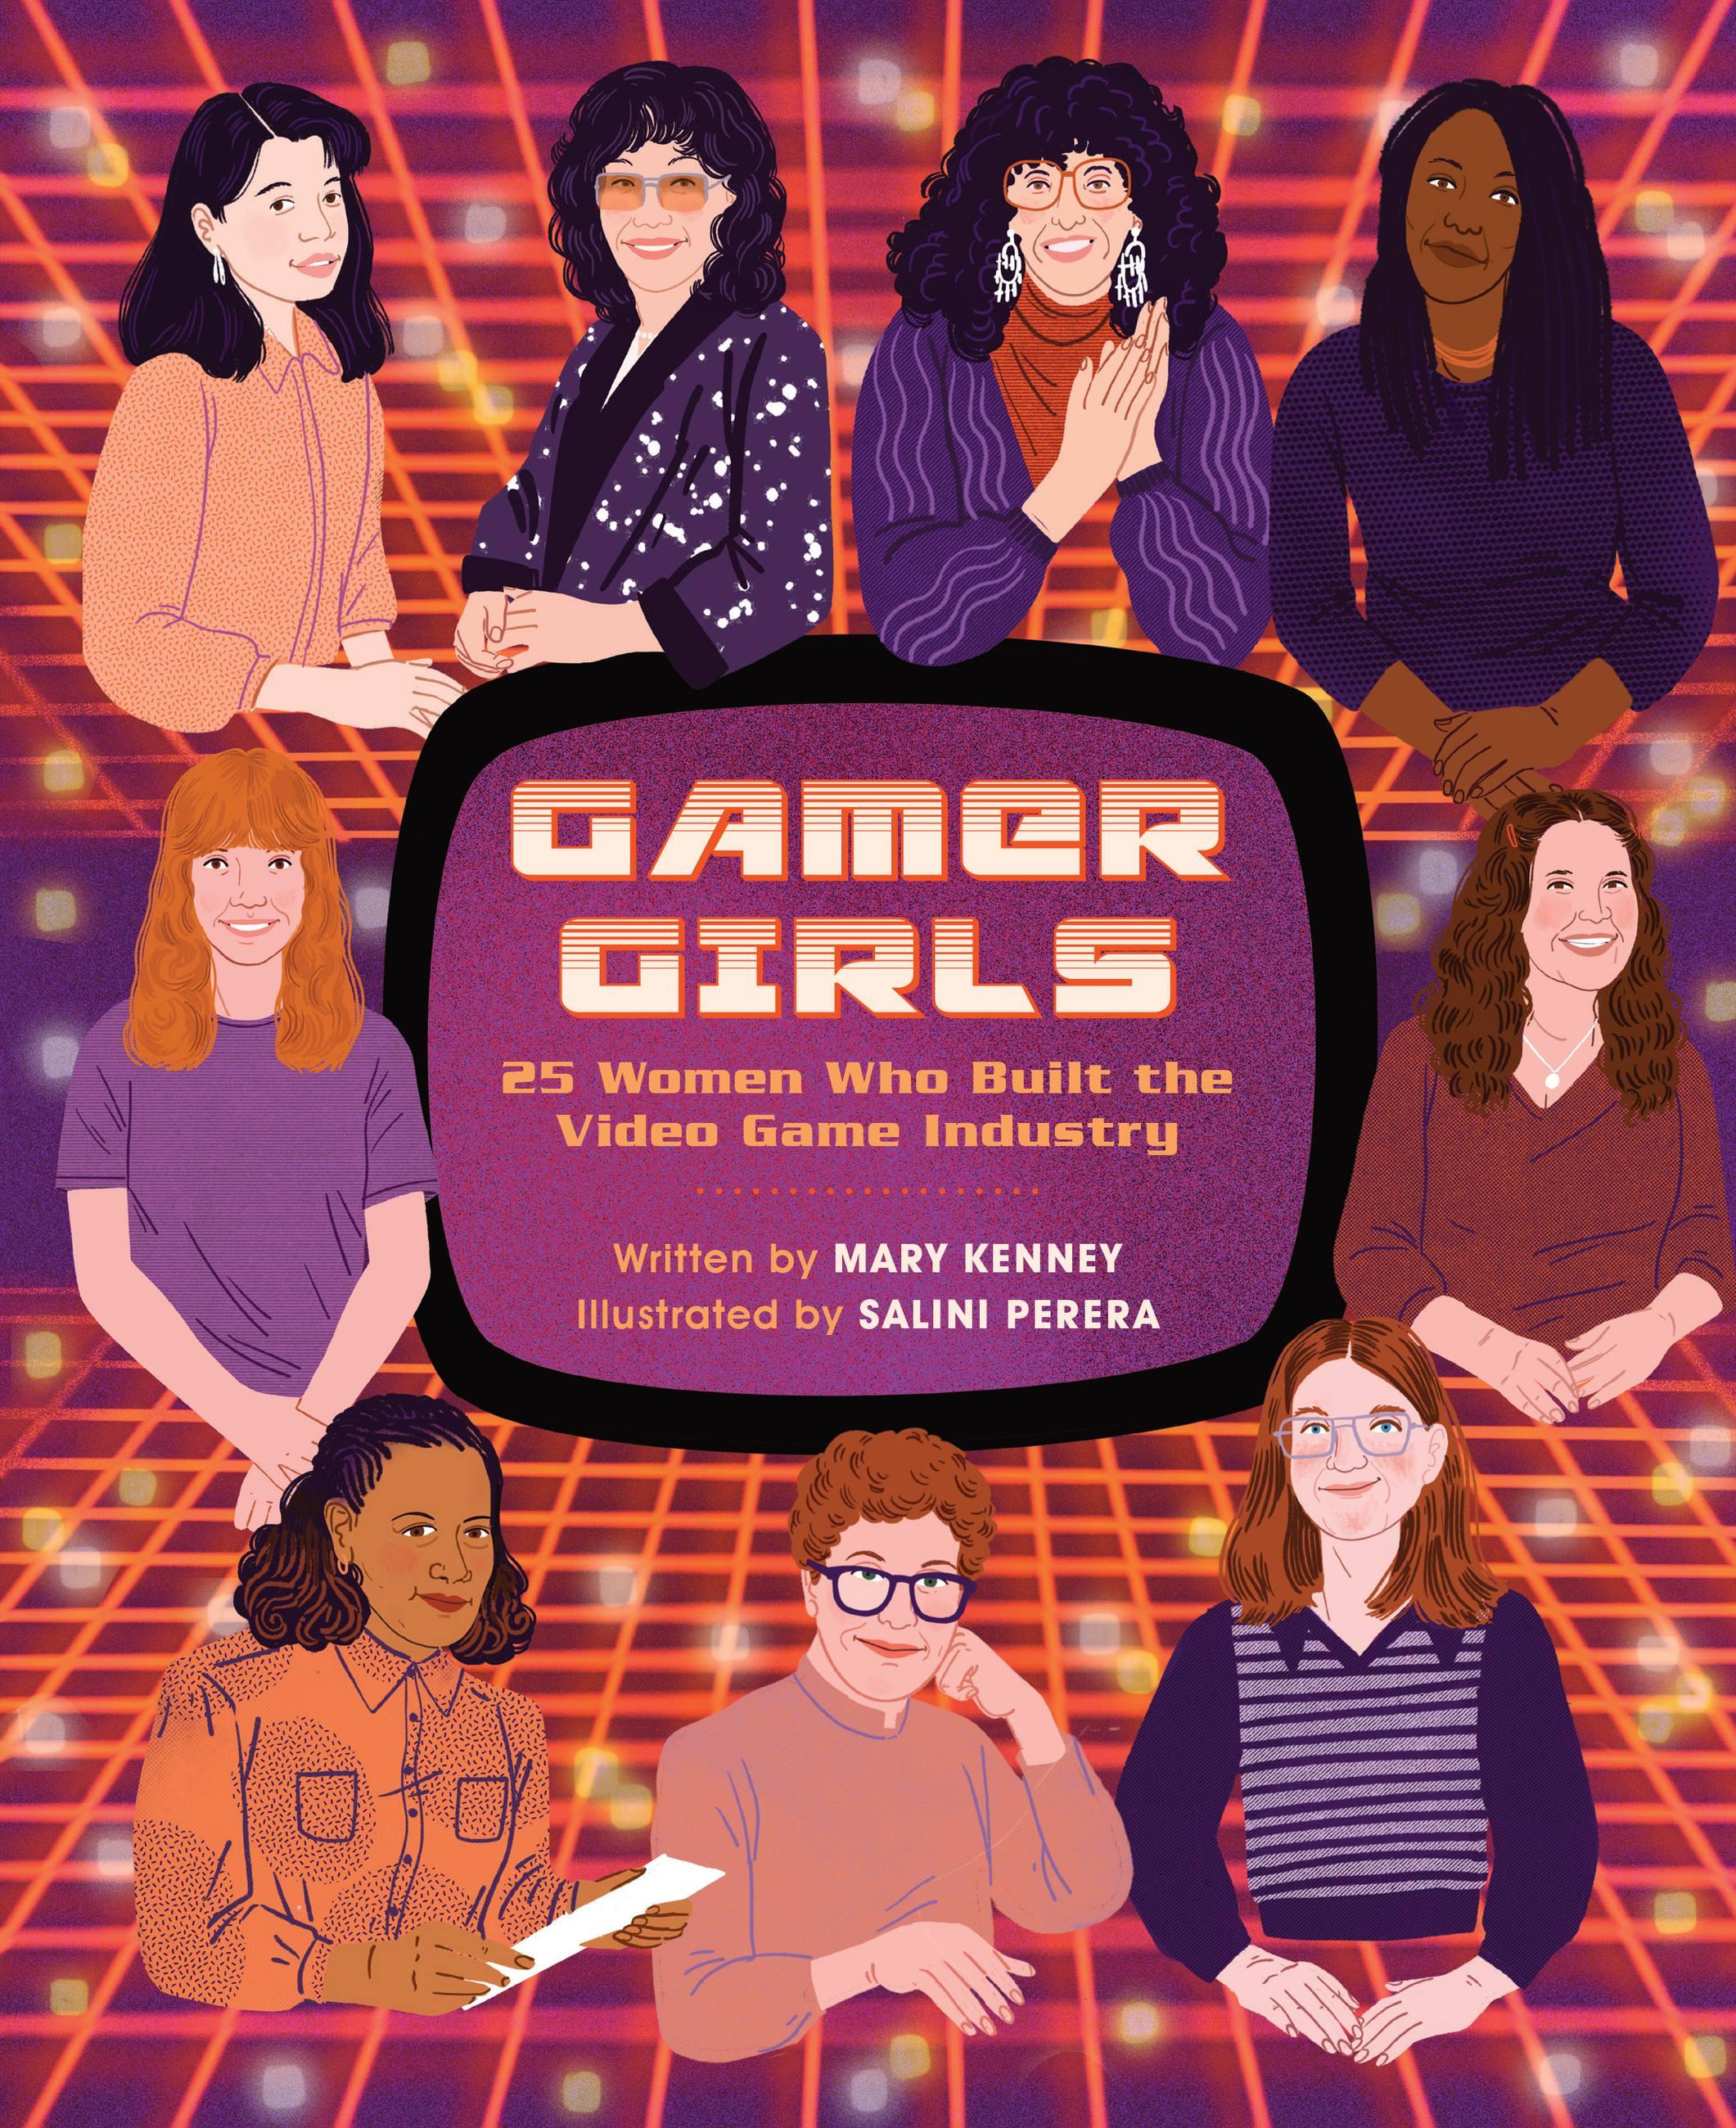 videojuegos mujeres industria, gamer girls, mary kenney